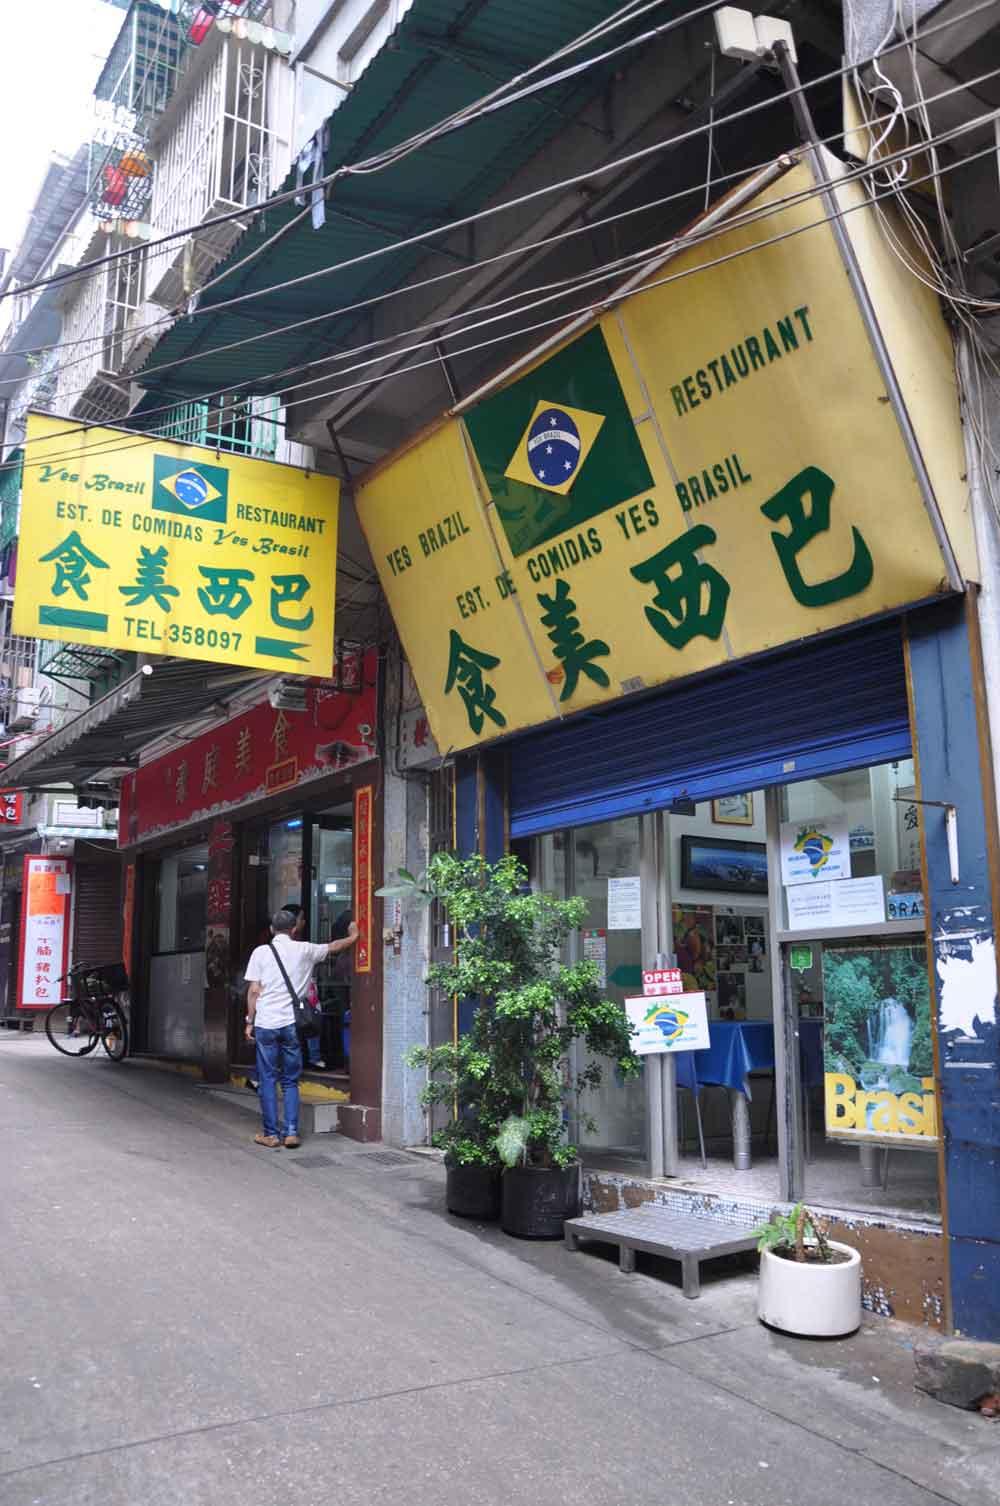 Yes Brazil Macau